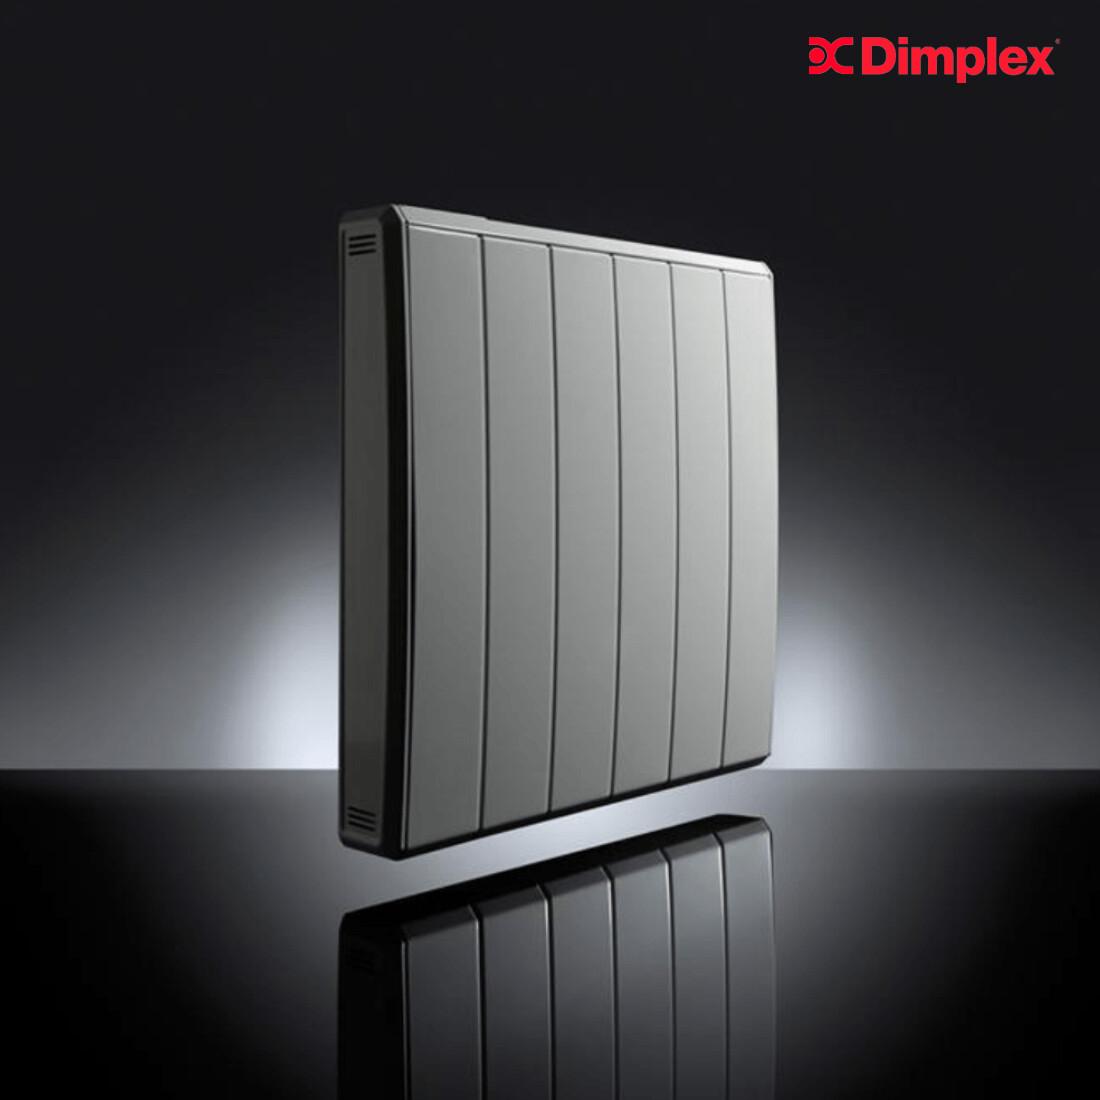 Dimplex 750w Q Rad Electric Radiator White Tradeshop